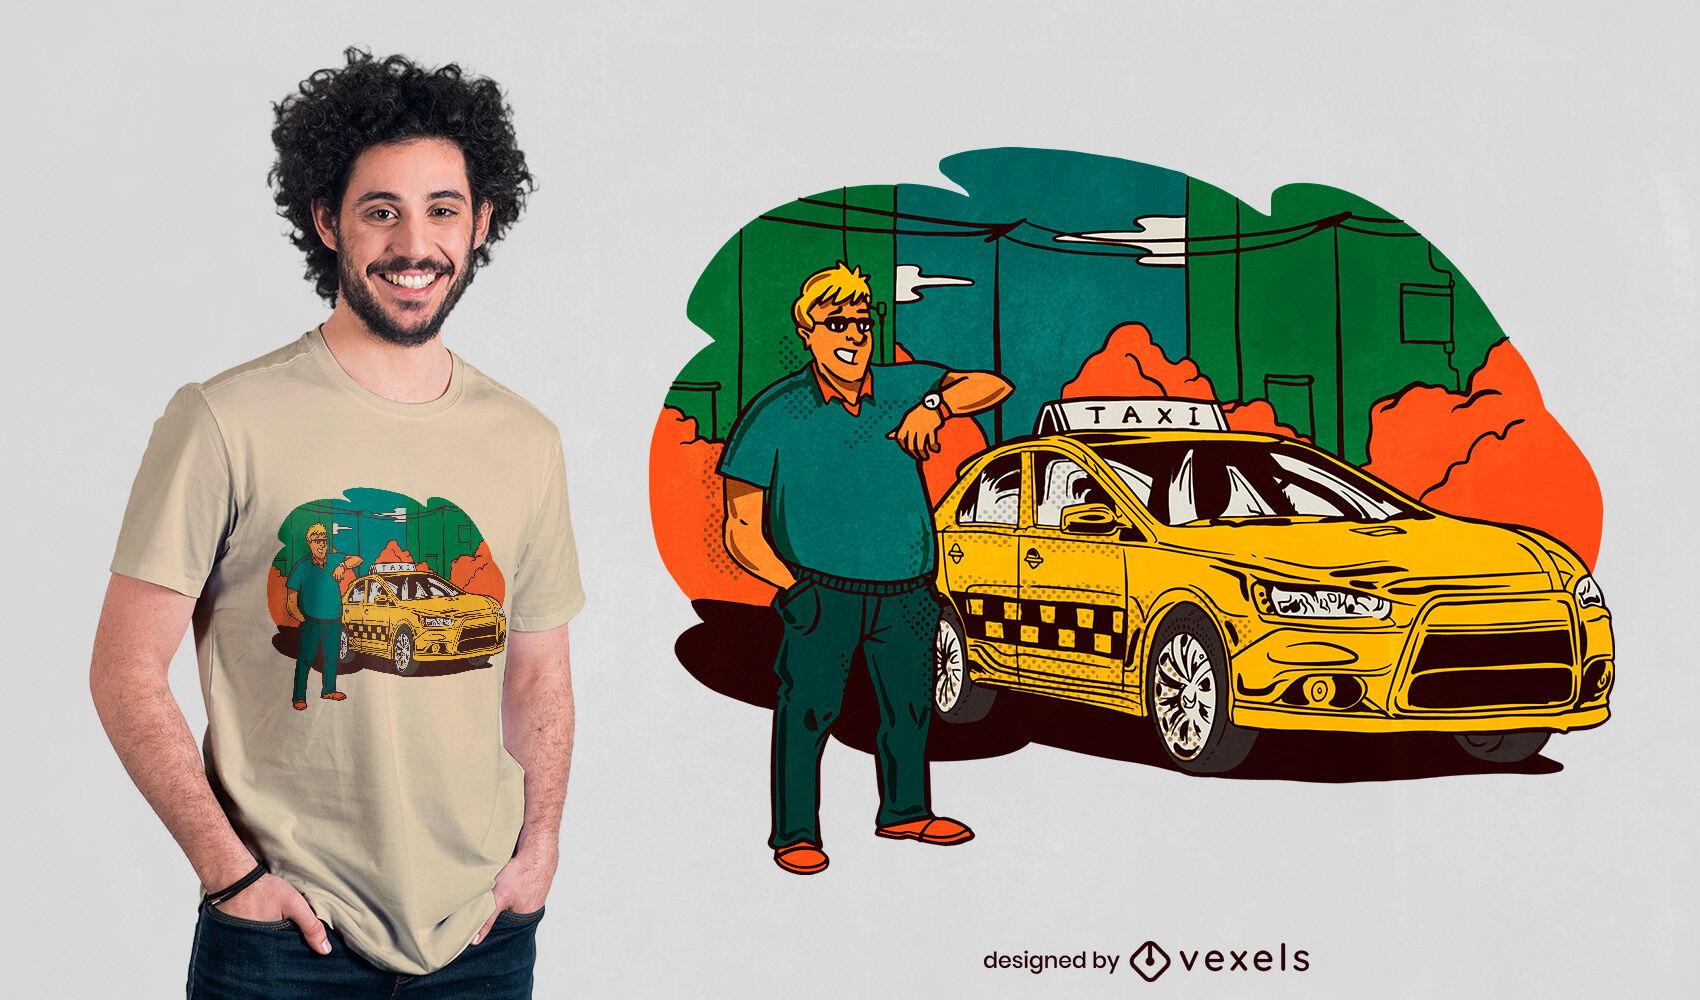 Taxi driver t-shirt design